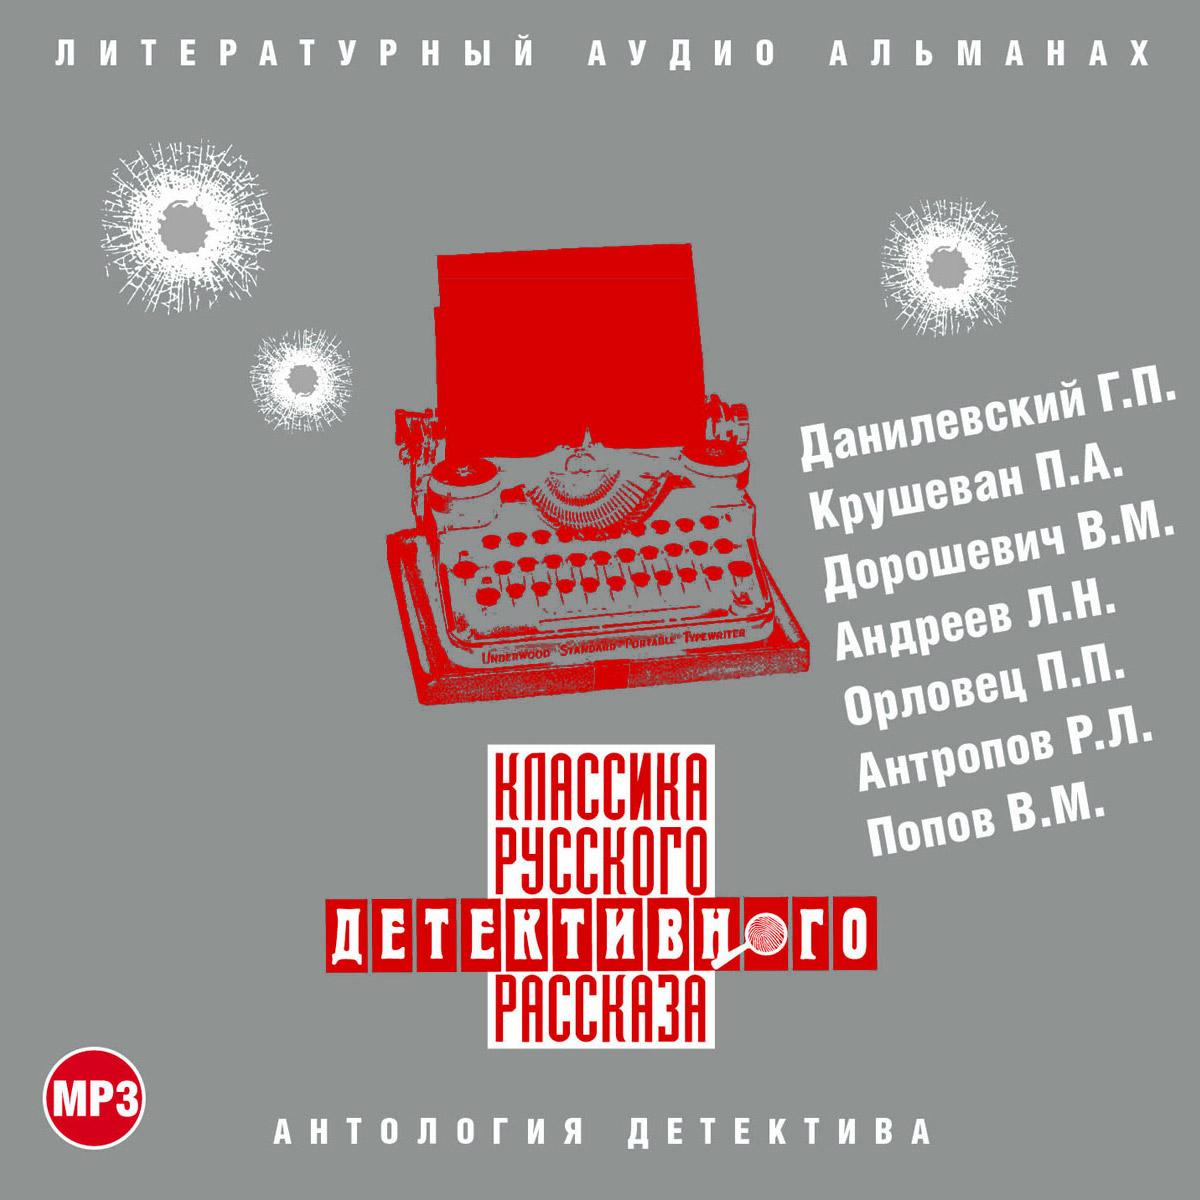 Классика русского детективного рассказа №2 (аудиокнига MP3)